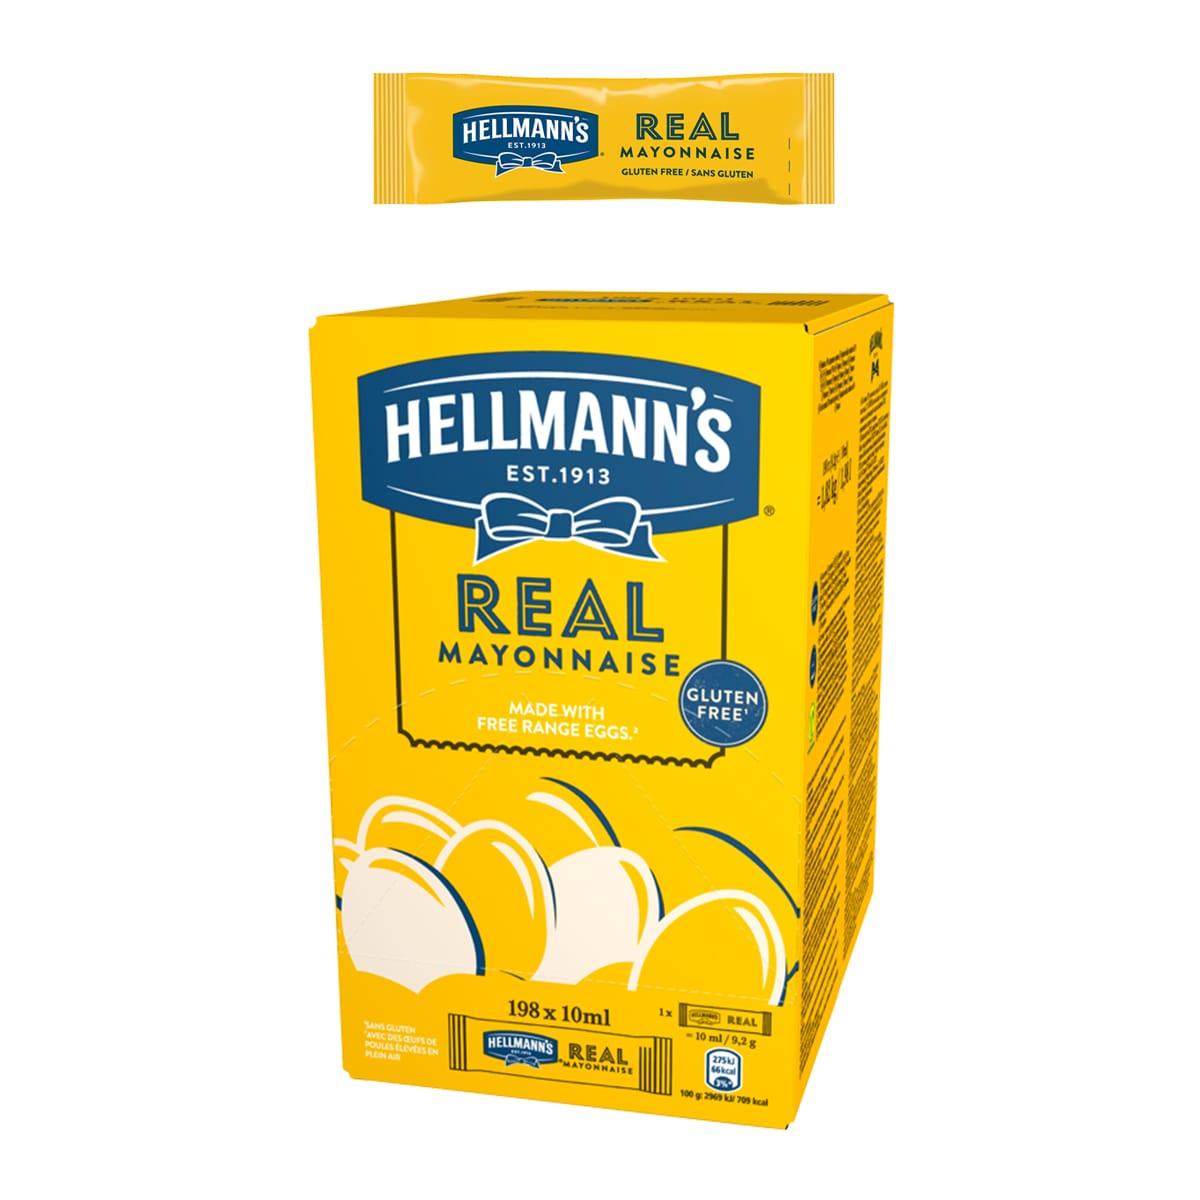 Hellmann's Майонеза Real доза 10 ml